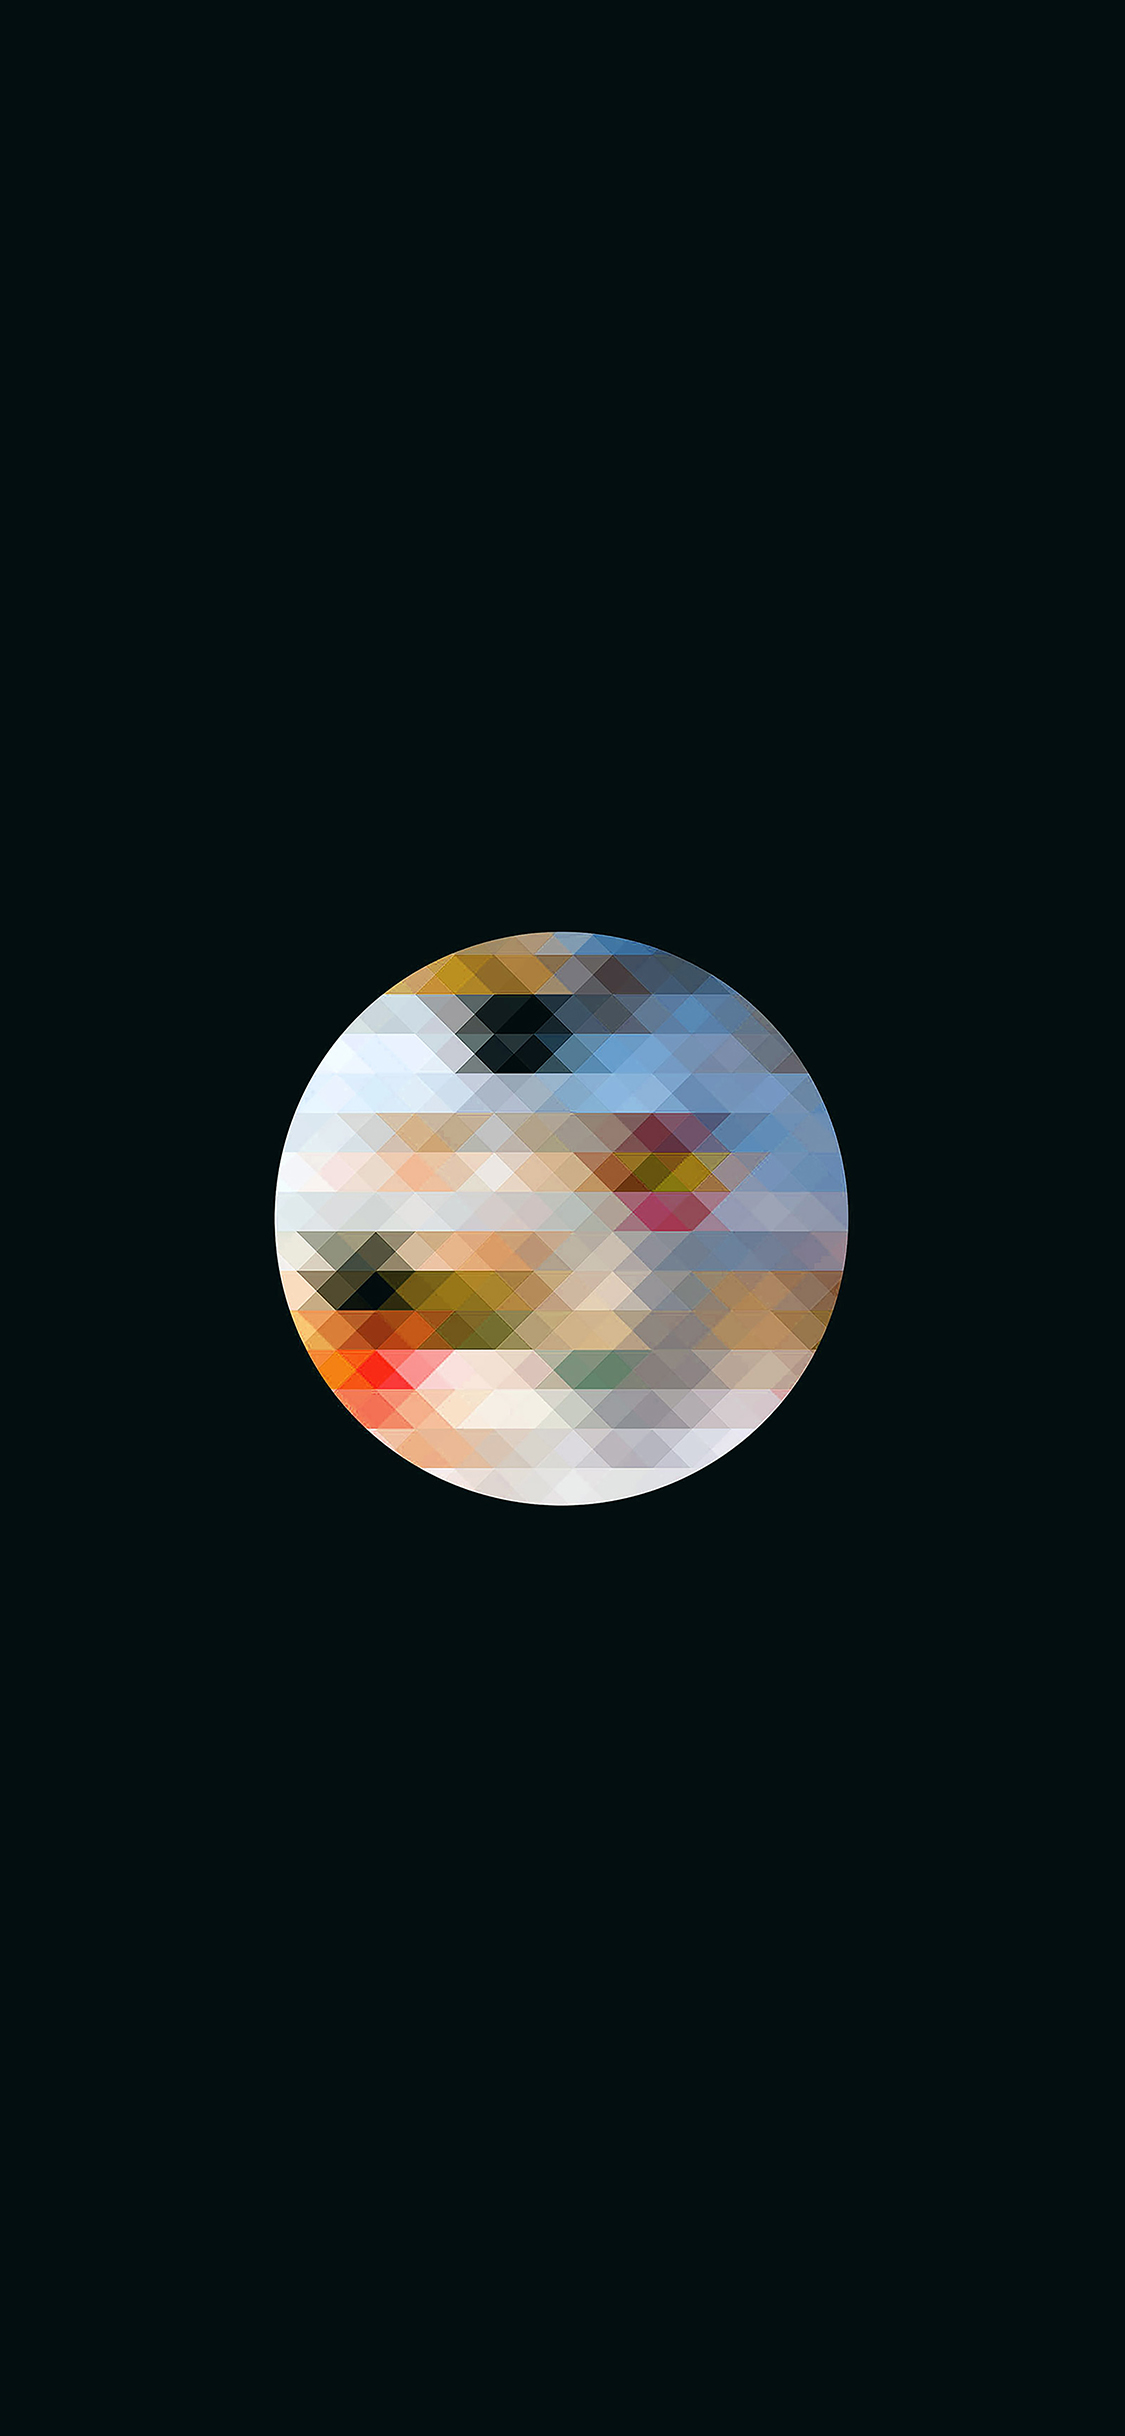 iPhoneXpapers.com-Apple-iPhone-wallpaper-va61-triangle-in-circle-dark-pattern